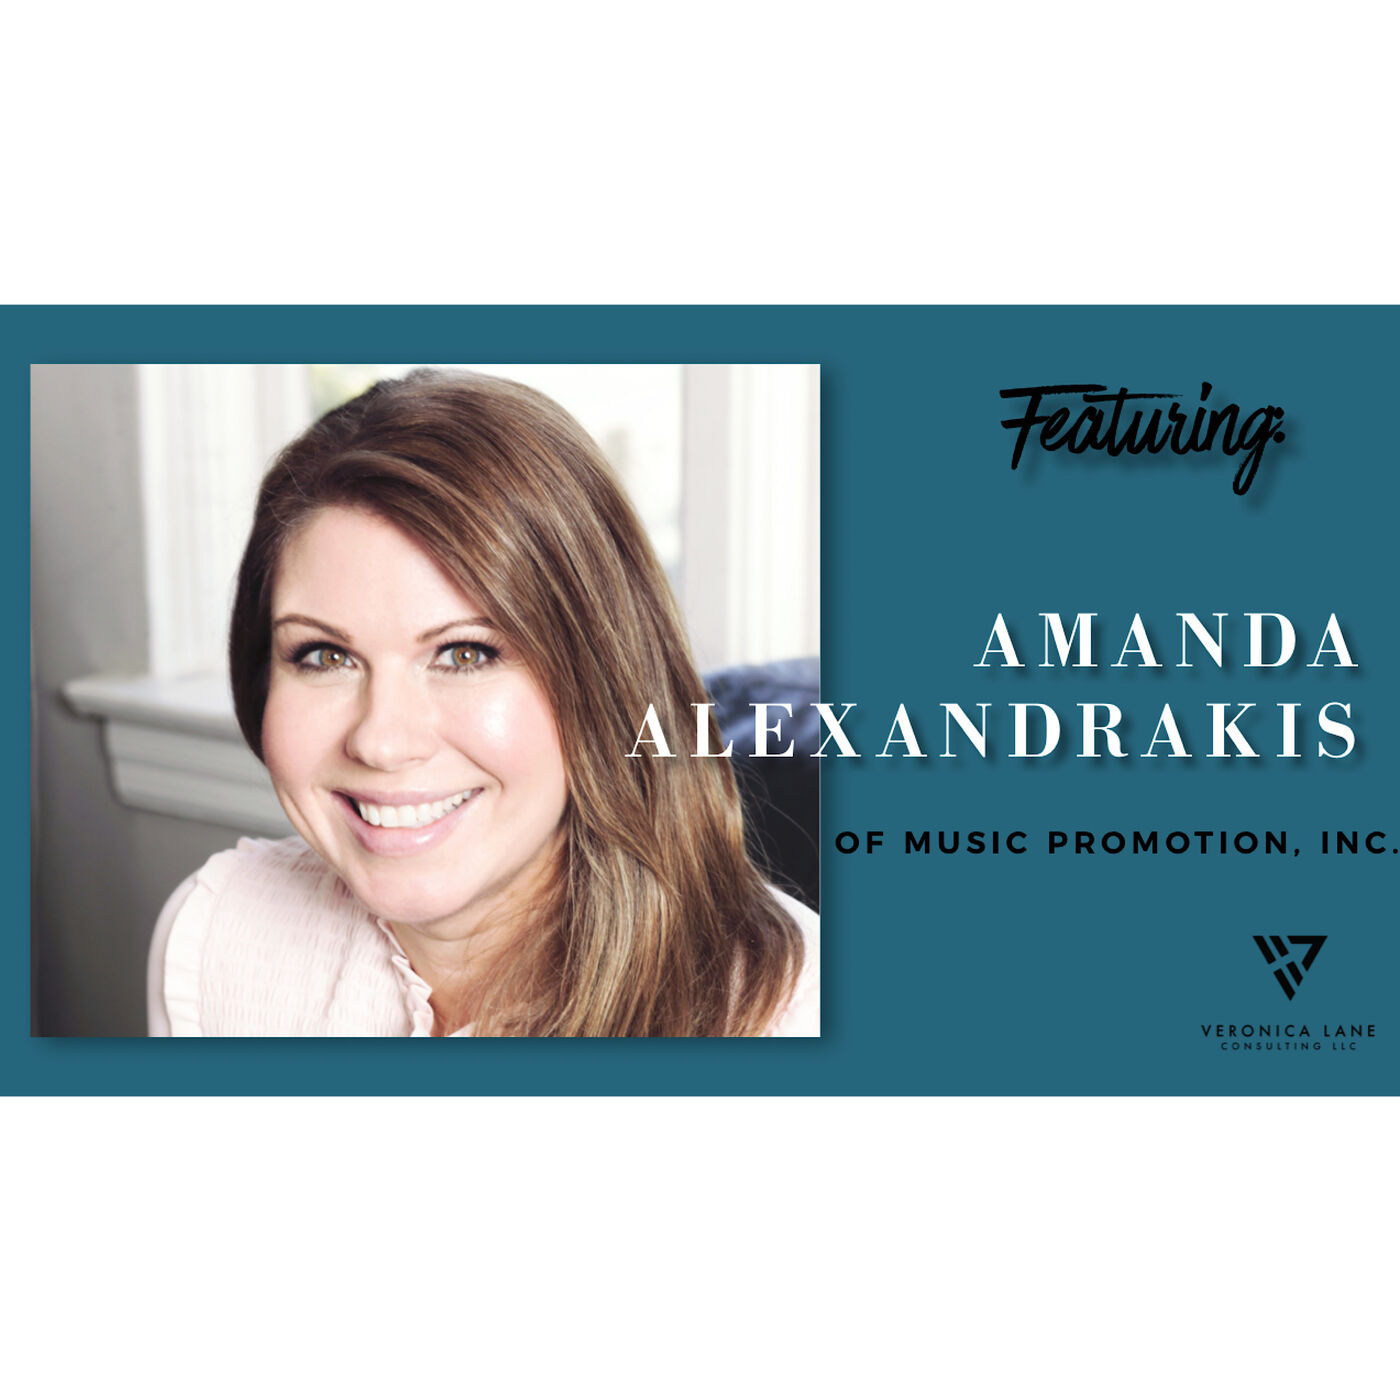 Project Management & Music Promotion: Featuring Music Promoter, Amanda Alexandrakis